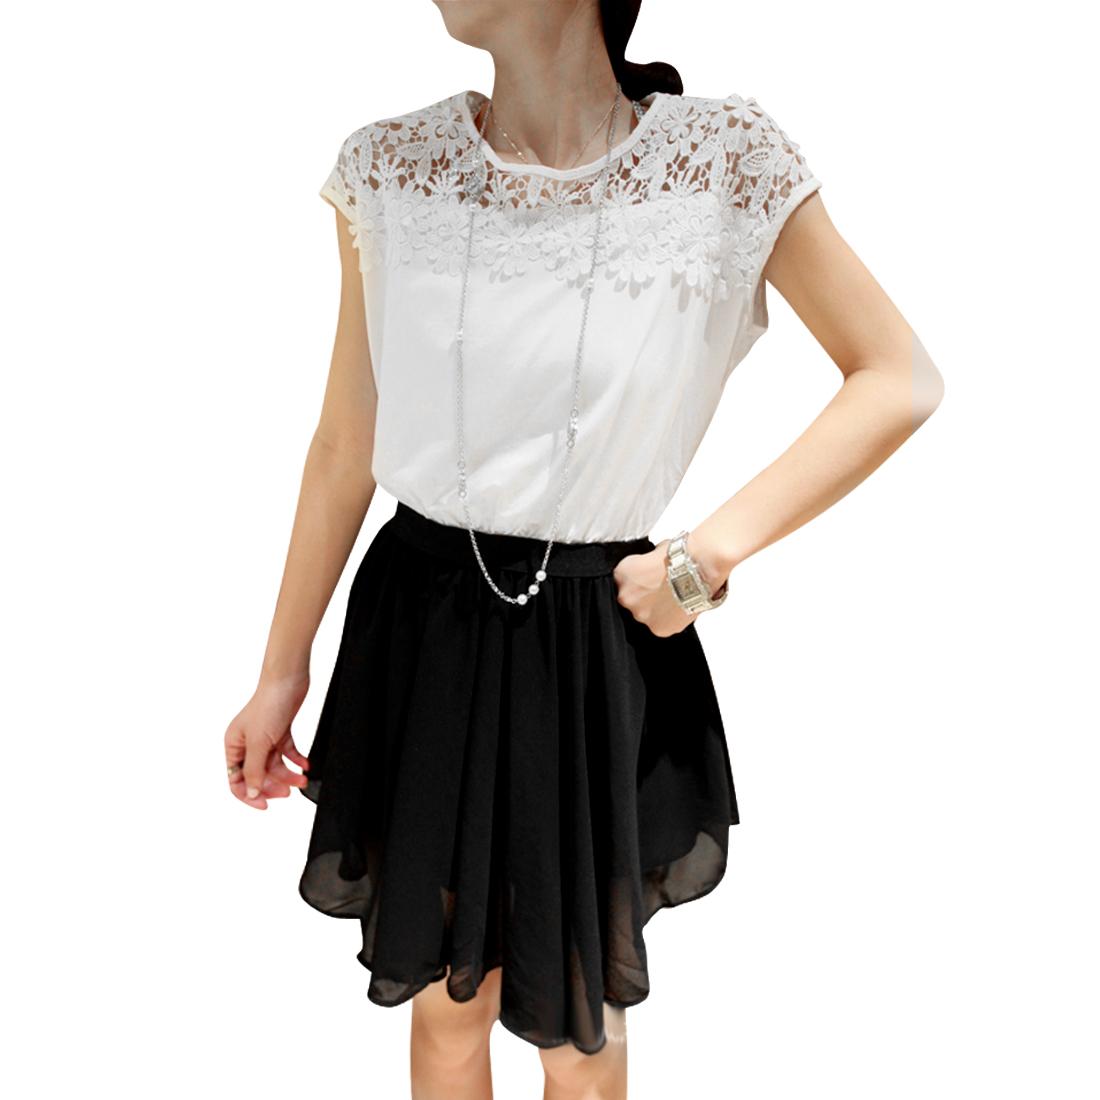 Women Round Neck Raglan Sleeve Crochet Dress White Black XS